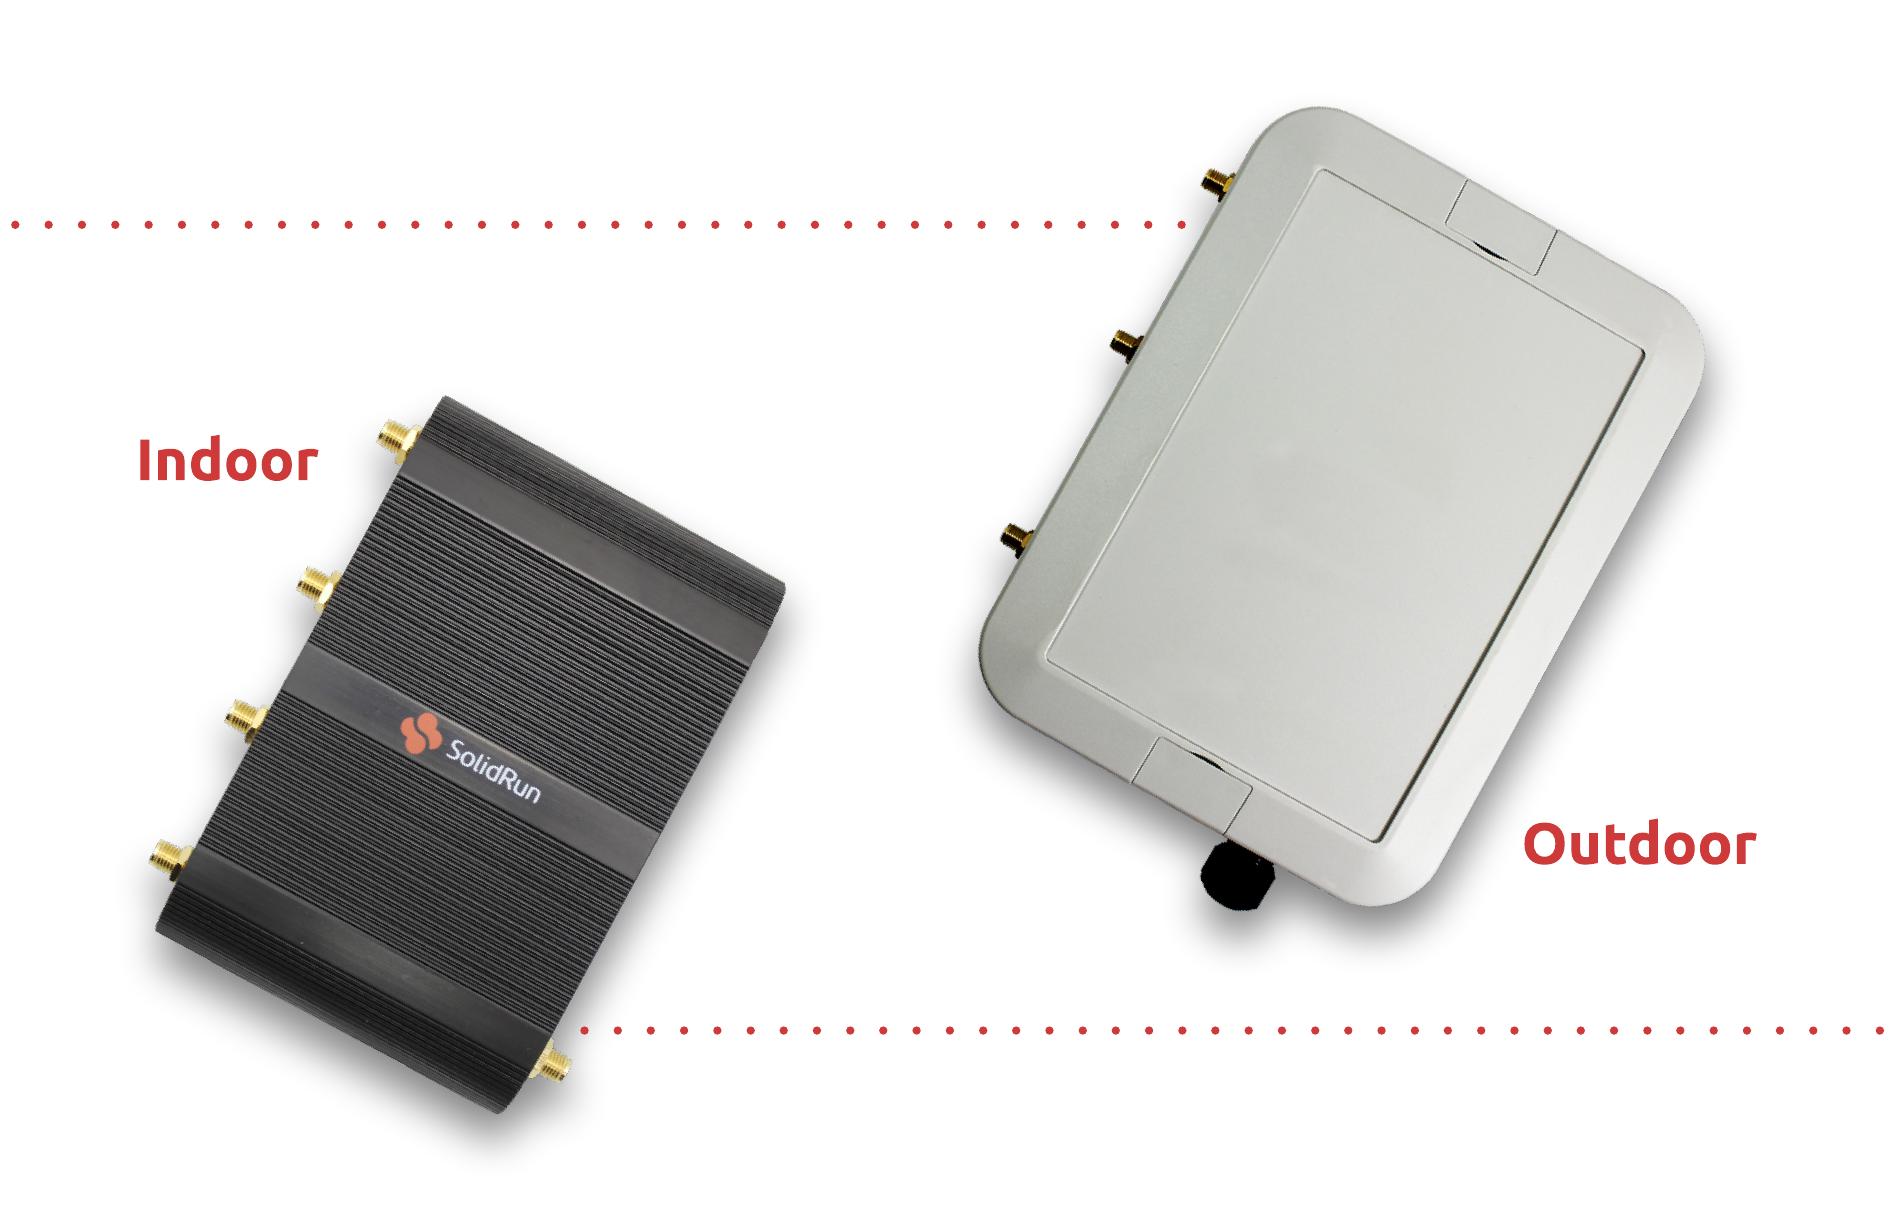 u-blox协助SolidRun推出新款IoT边缘网关